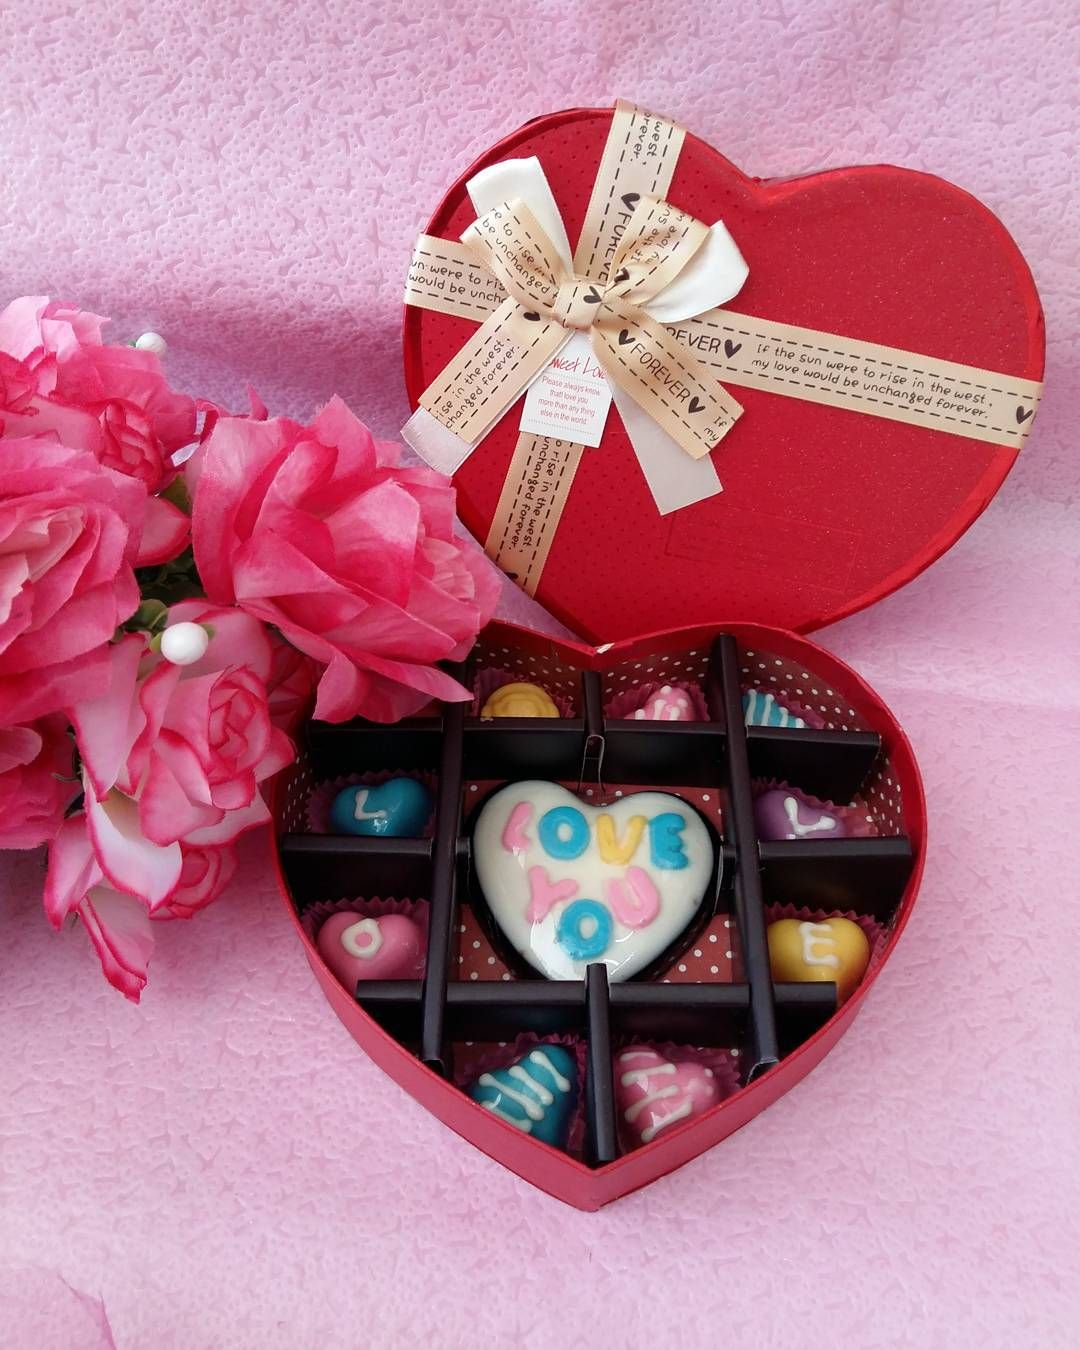 Online Shop Medan On Instagram Valentine Valentineday Valentinegift Valentinechocolate Chocolate Gift Coklat Coklatvalentine Hadiahvalentine